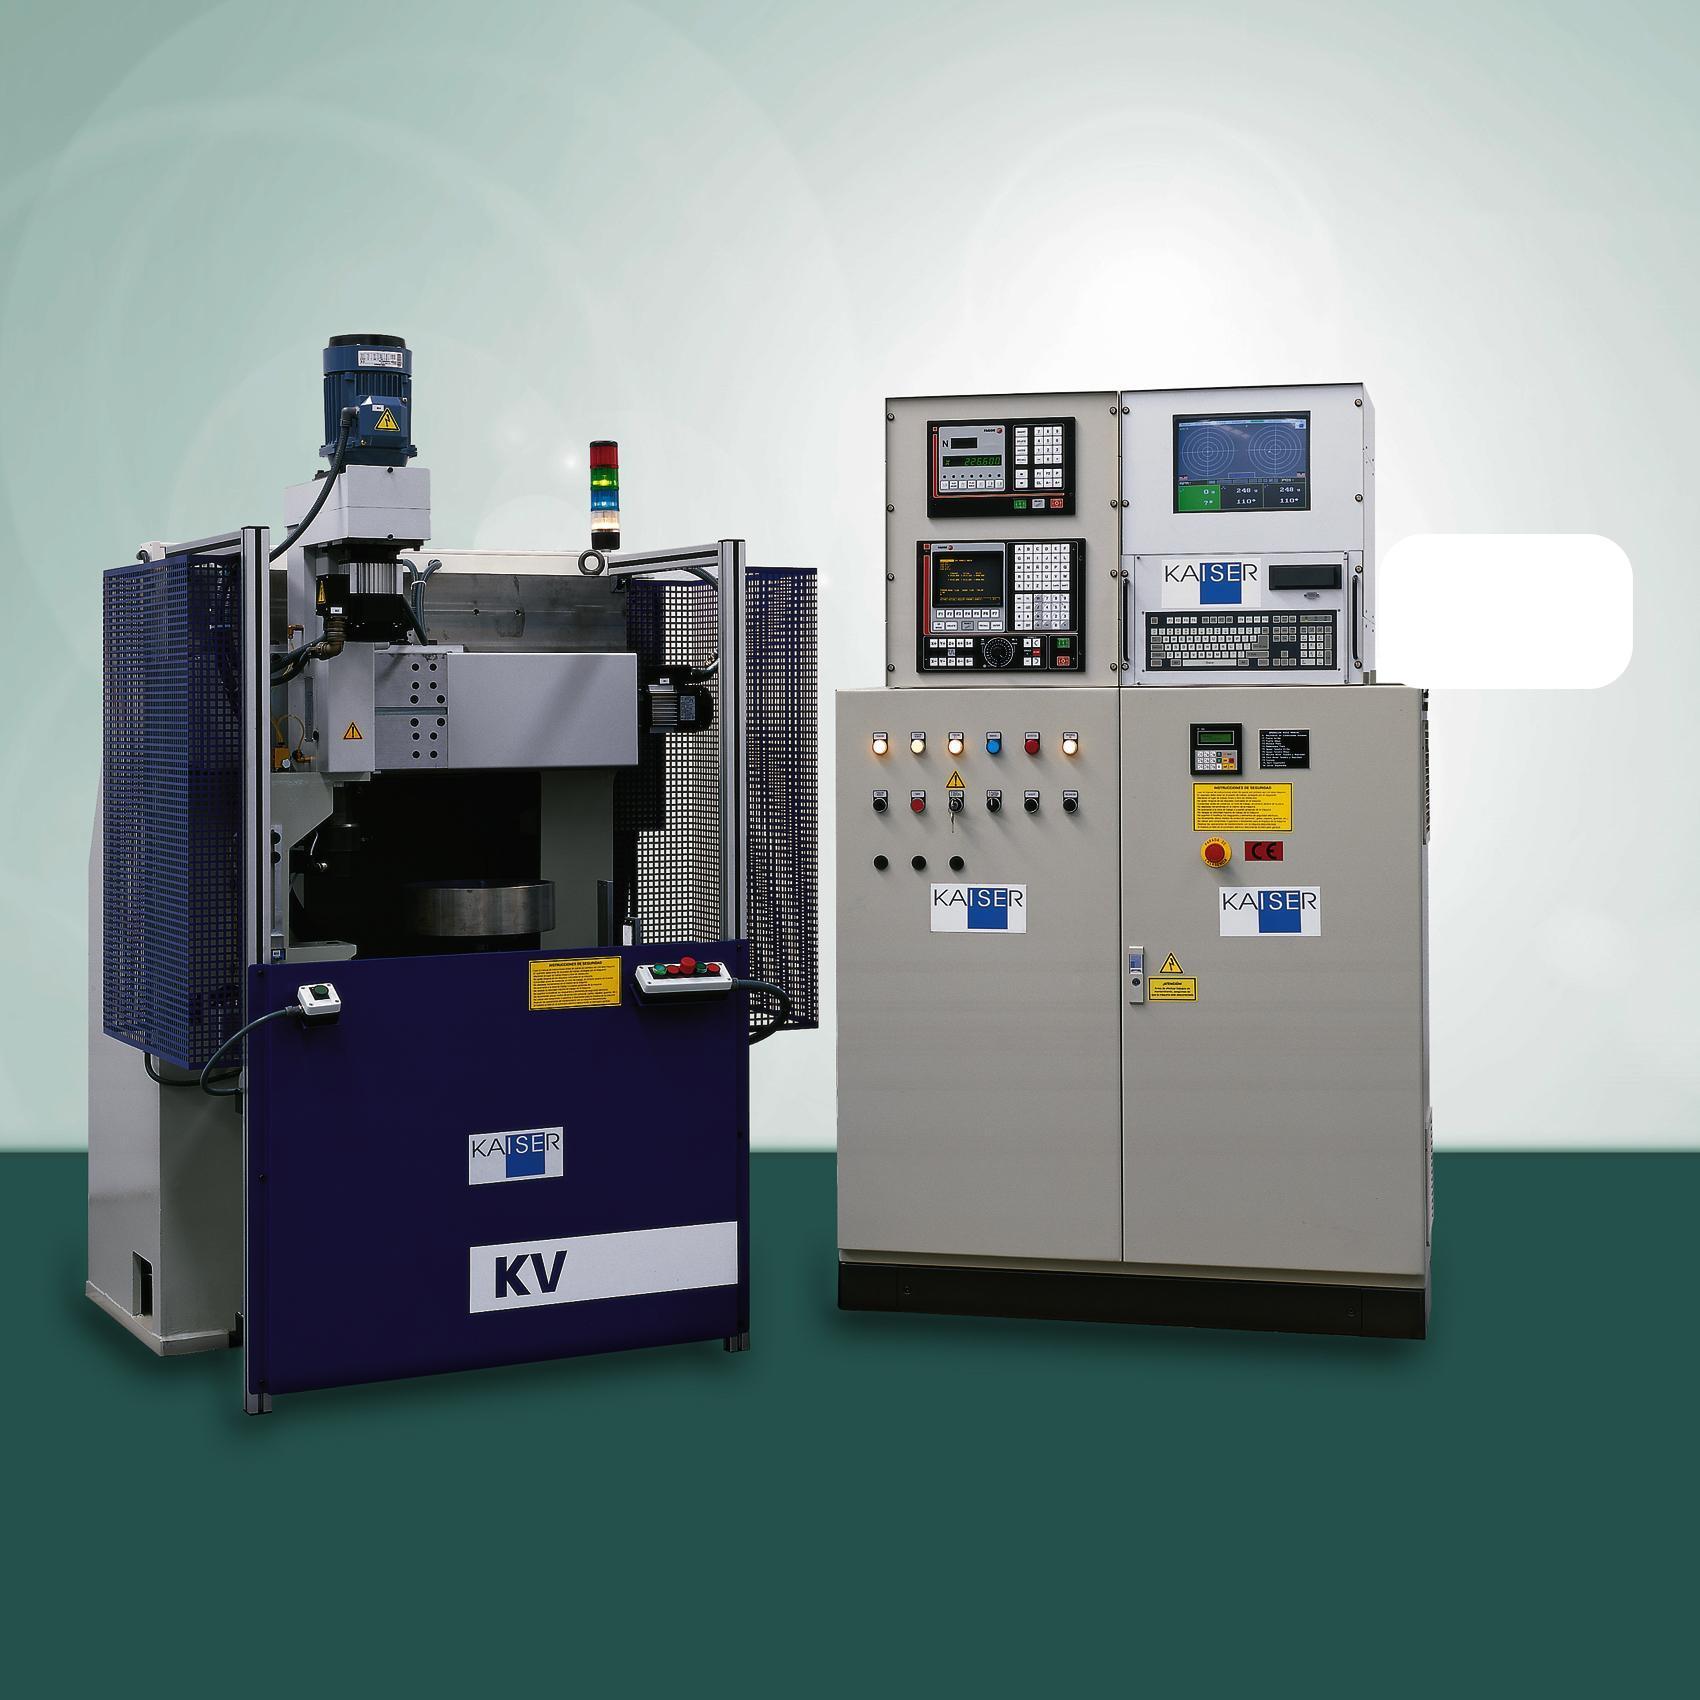 KV30-100 CNC3 TV USED BALANCING MACHINE